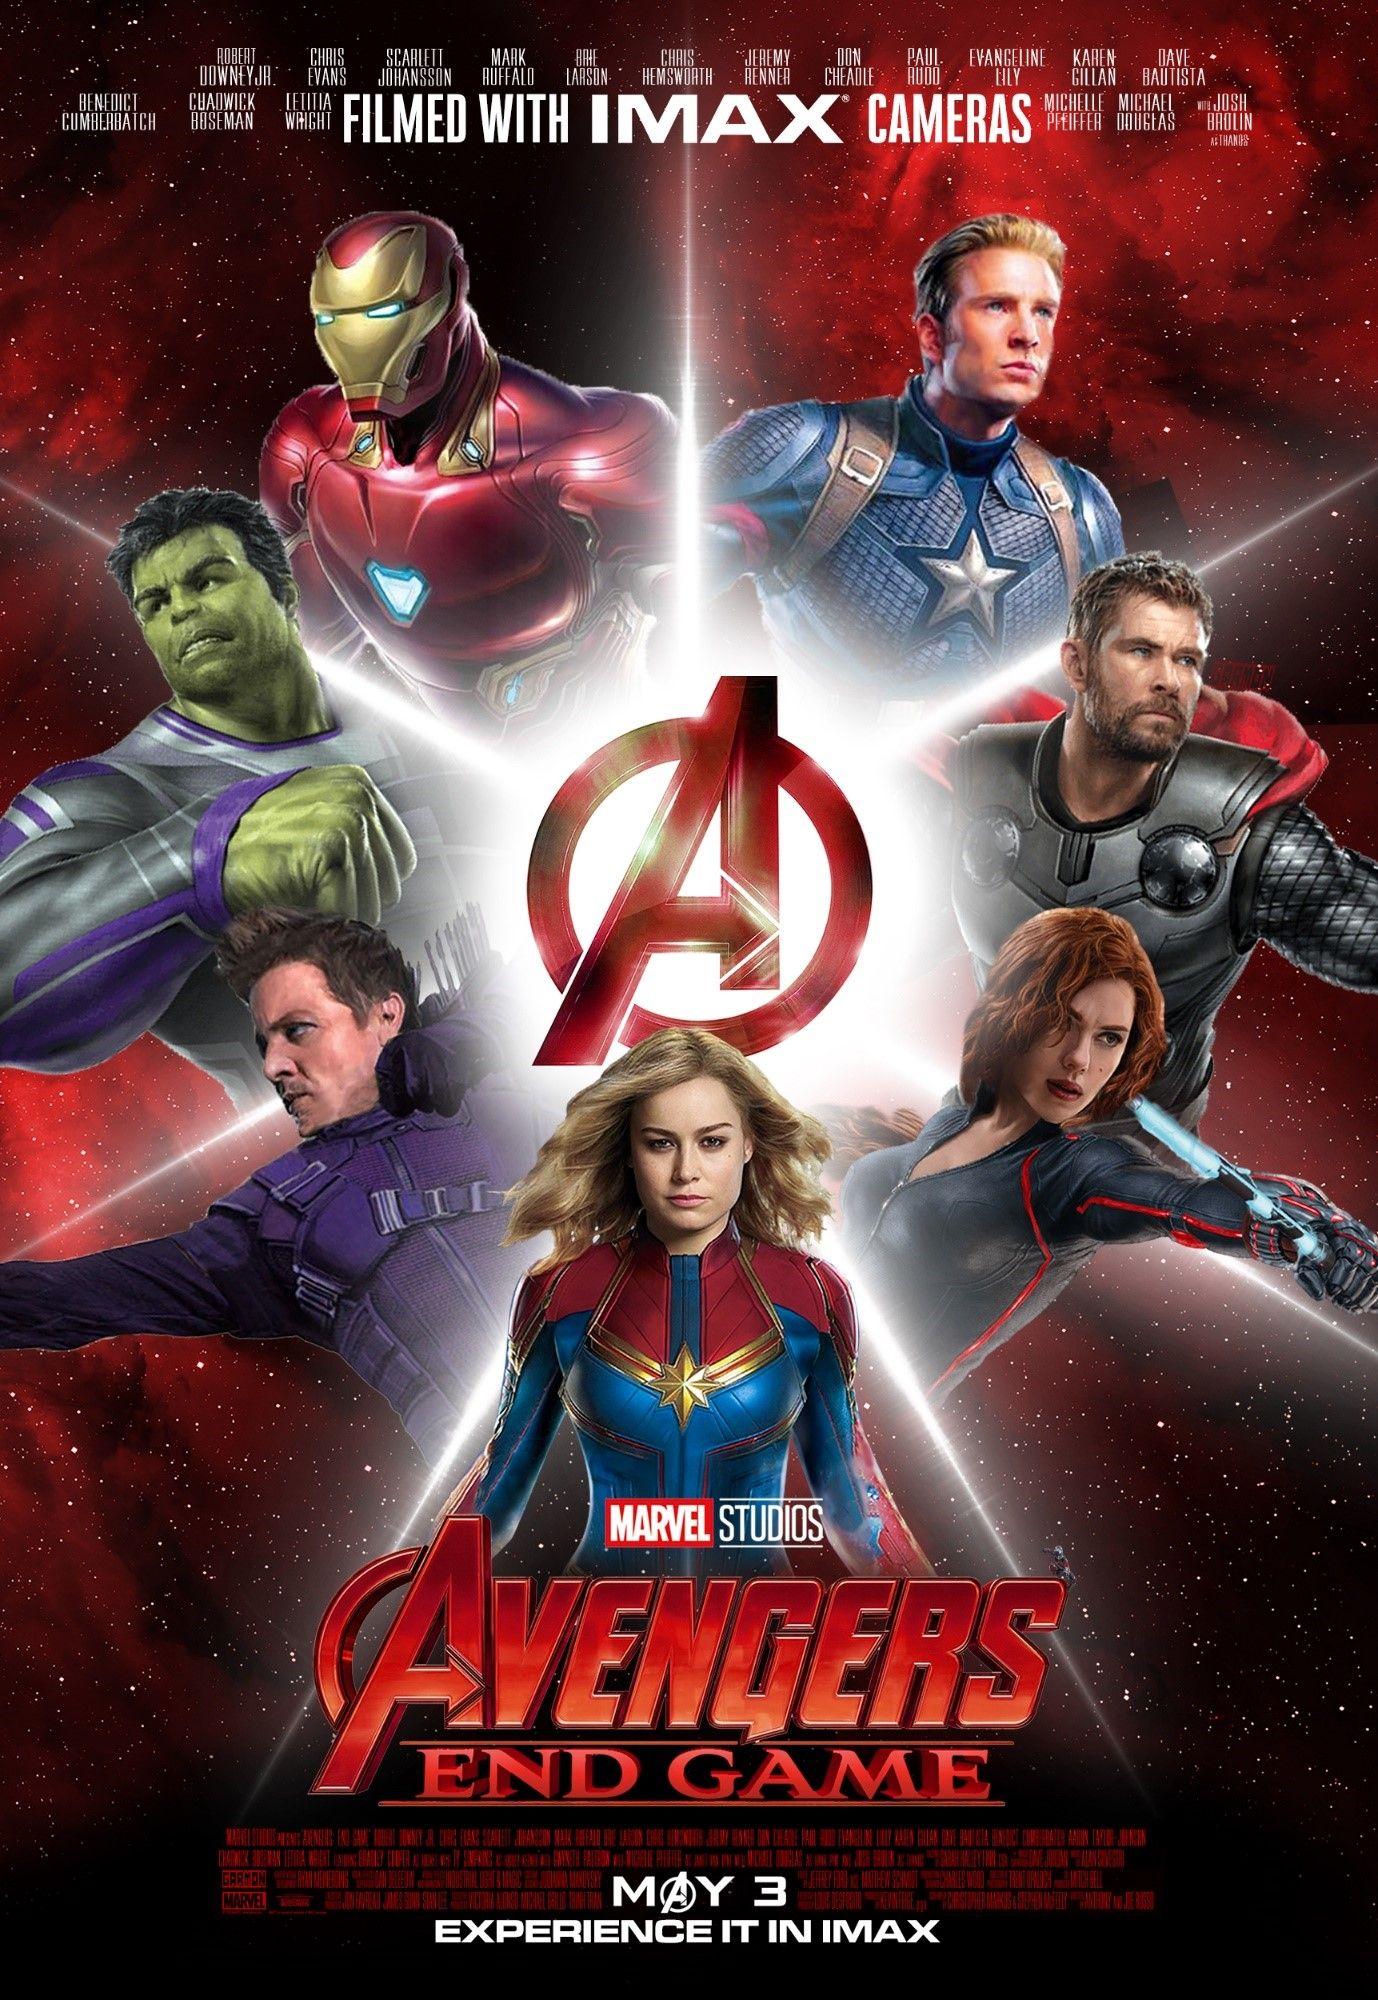 iron man 4 full movie online free